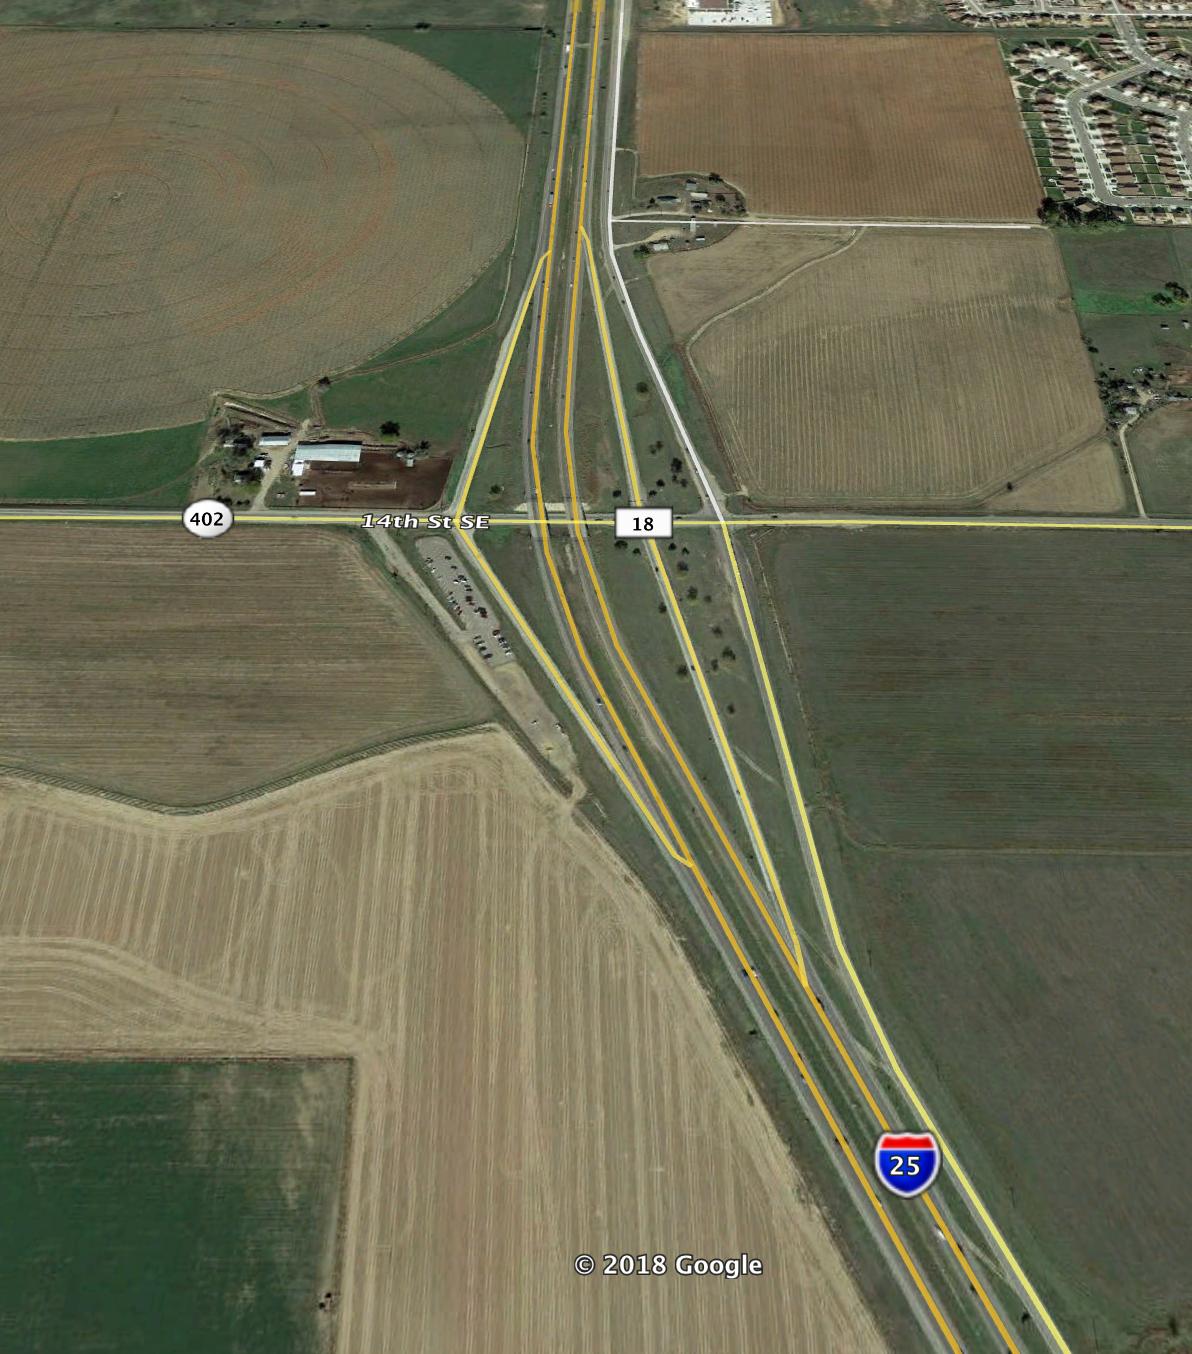 Colorado Highway 402 and I-25